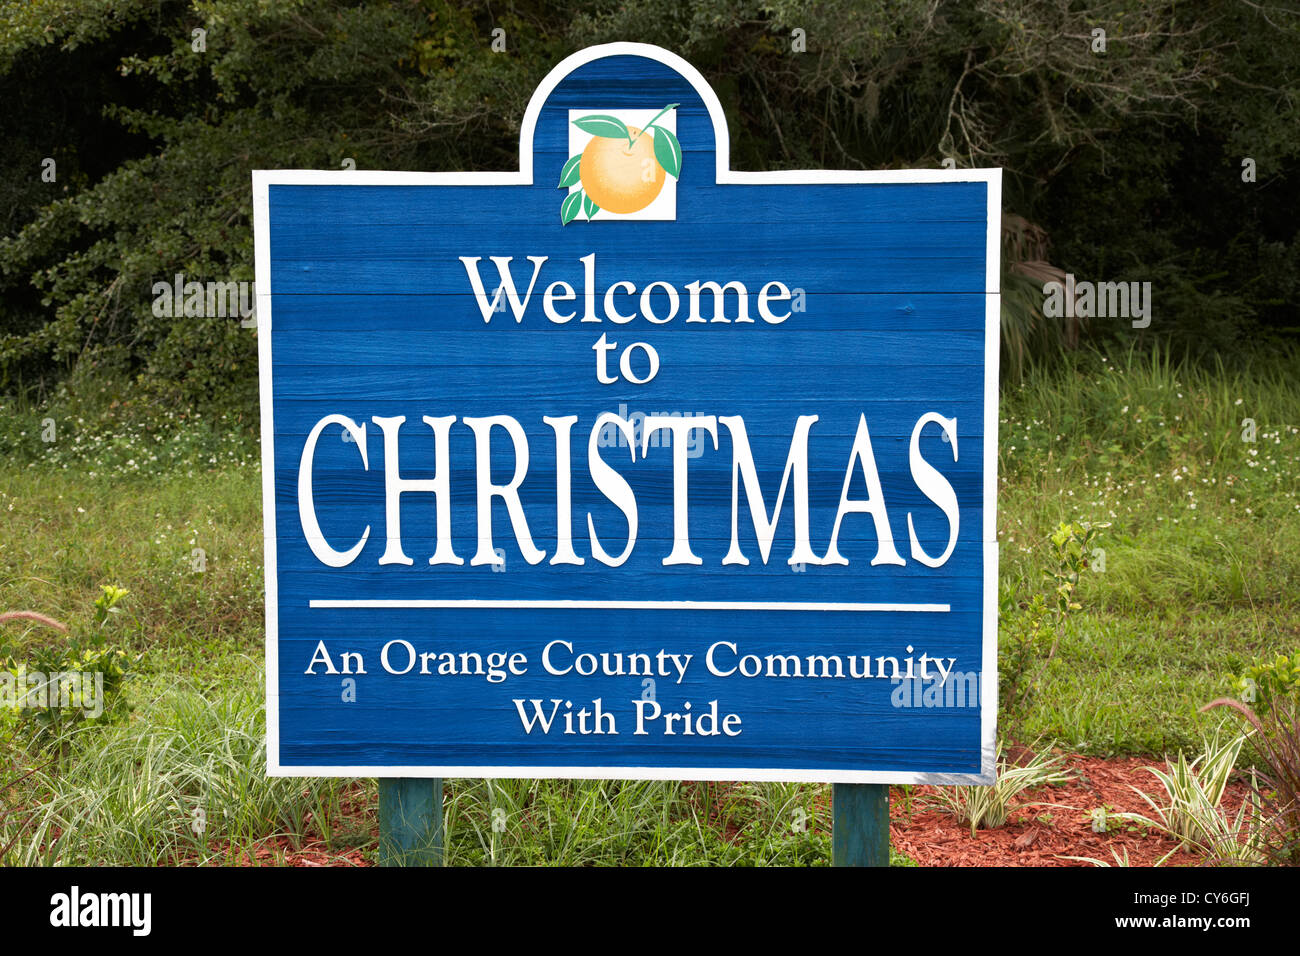 welcome to the town of christmas sign orange county florida usa - Stock Image